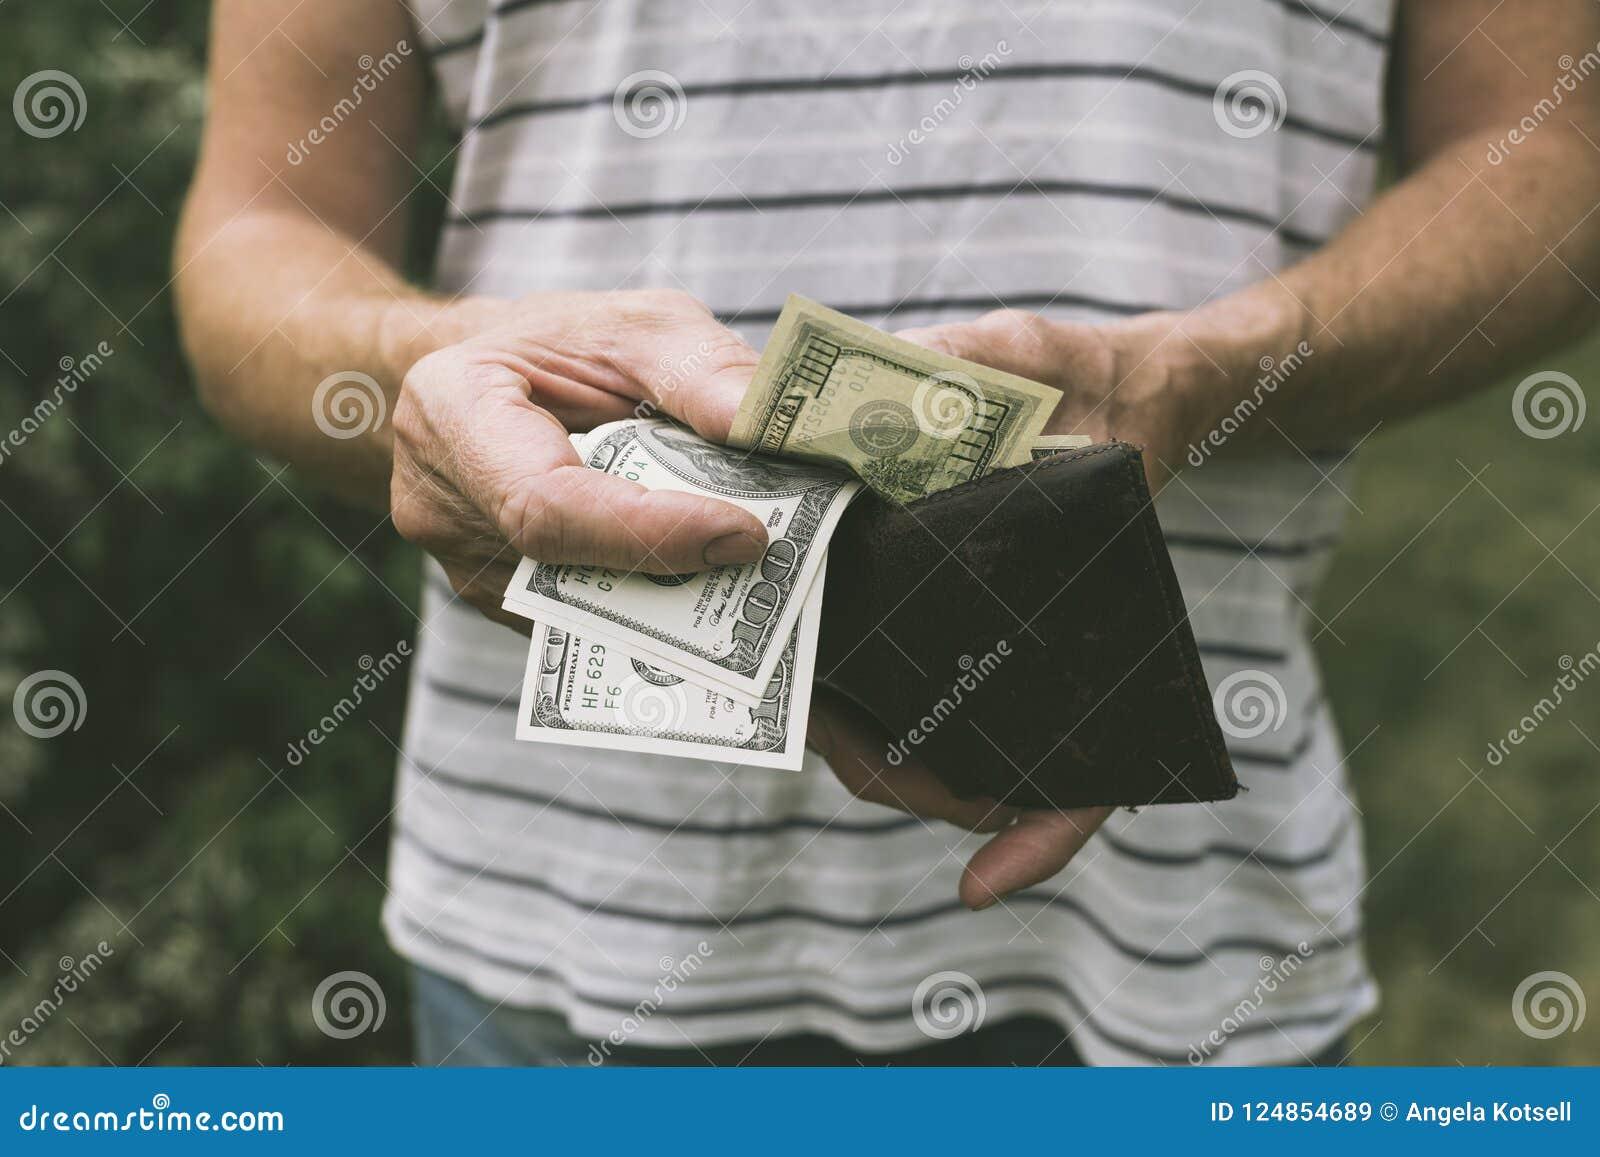 A man offering us dollars